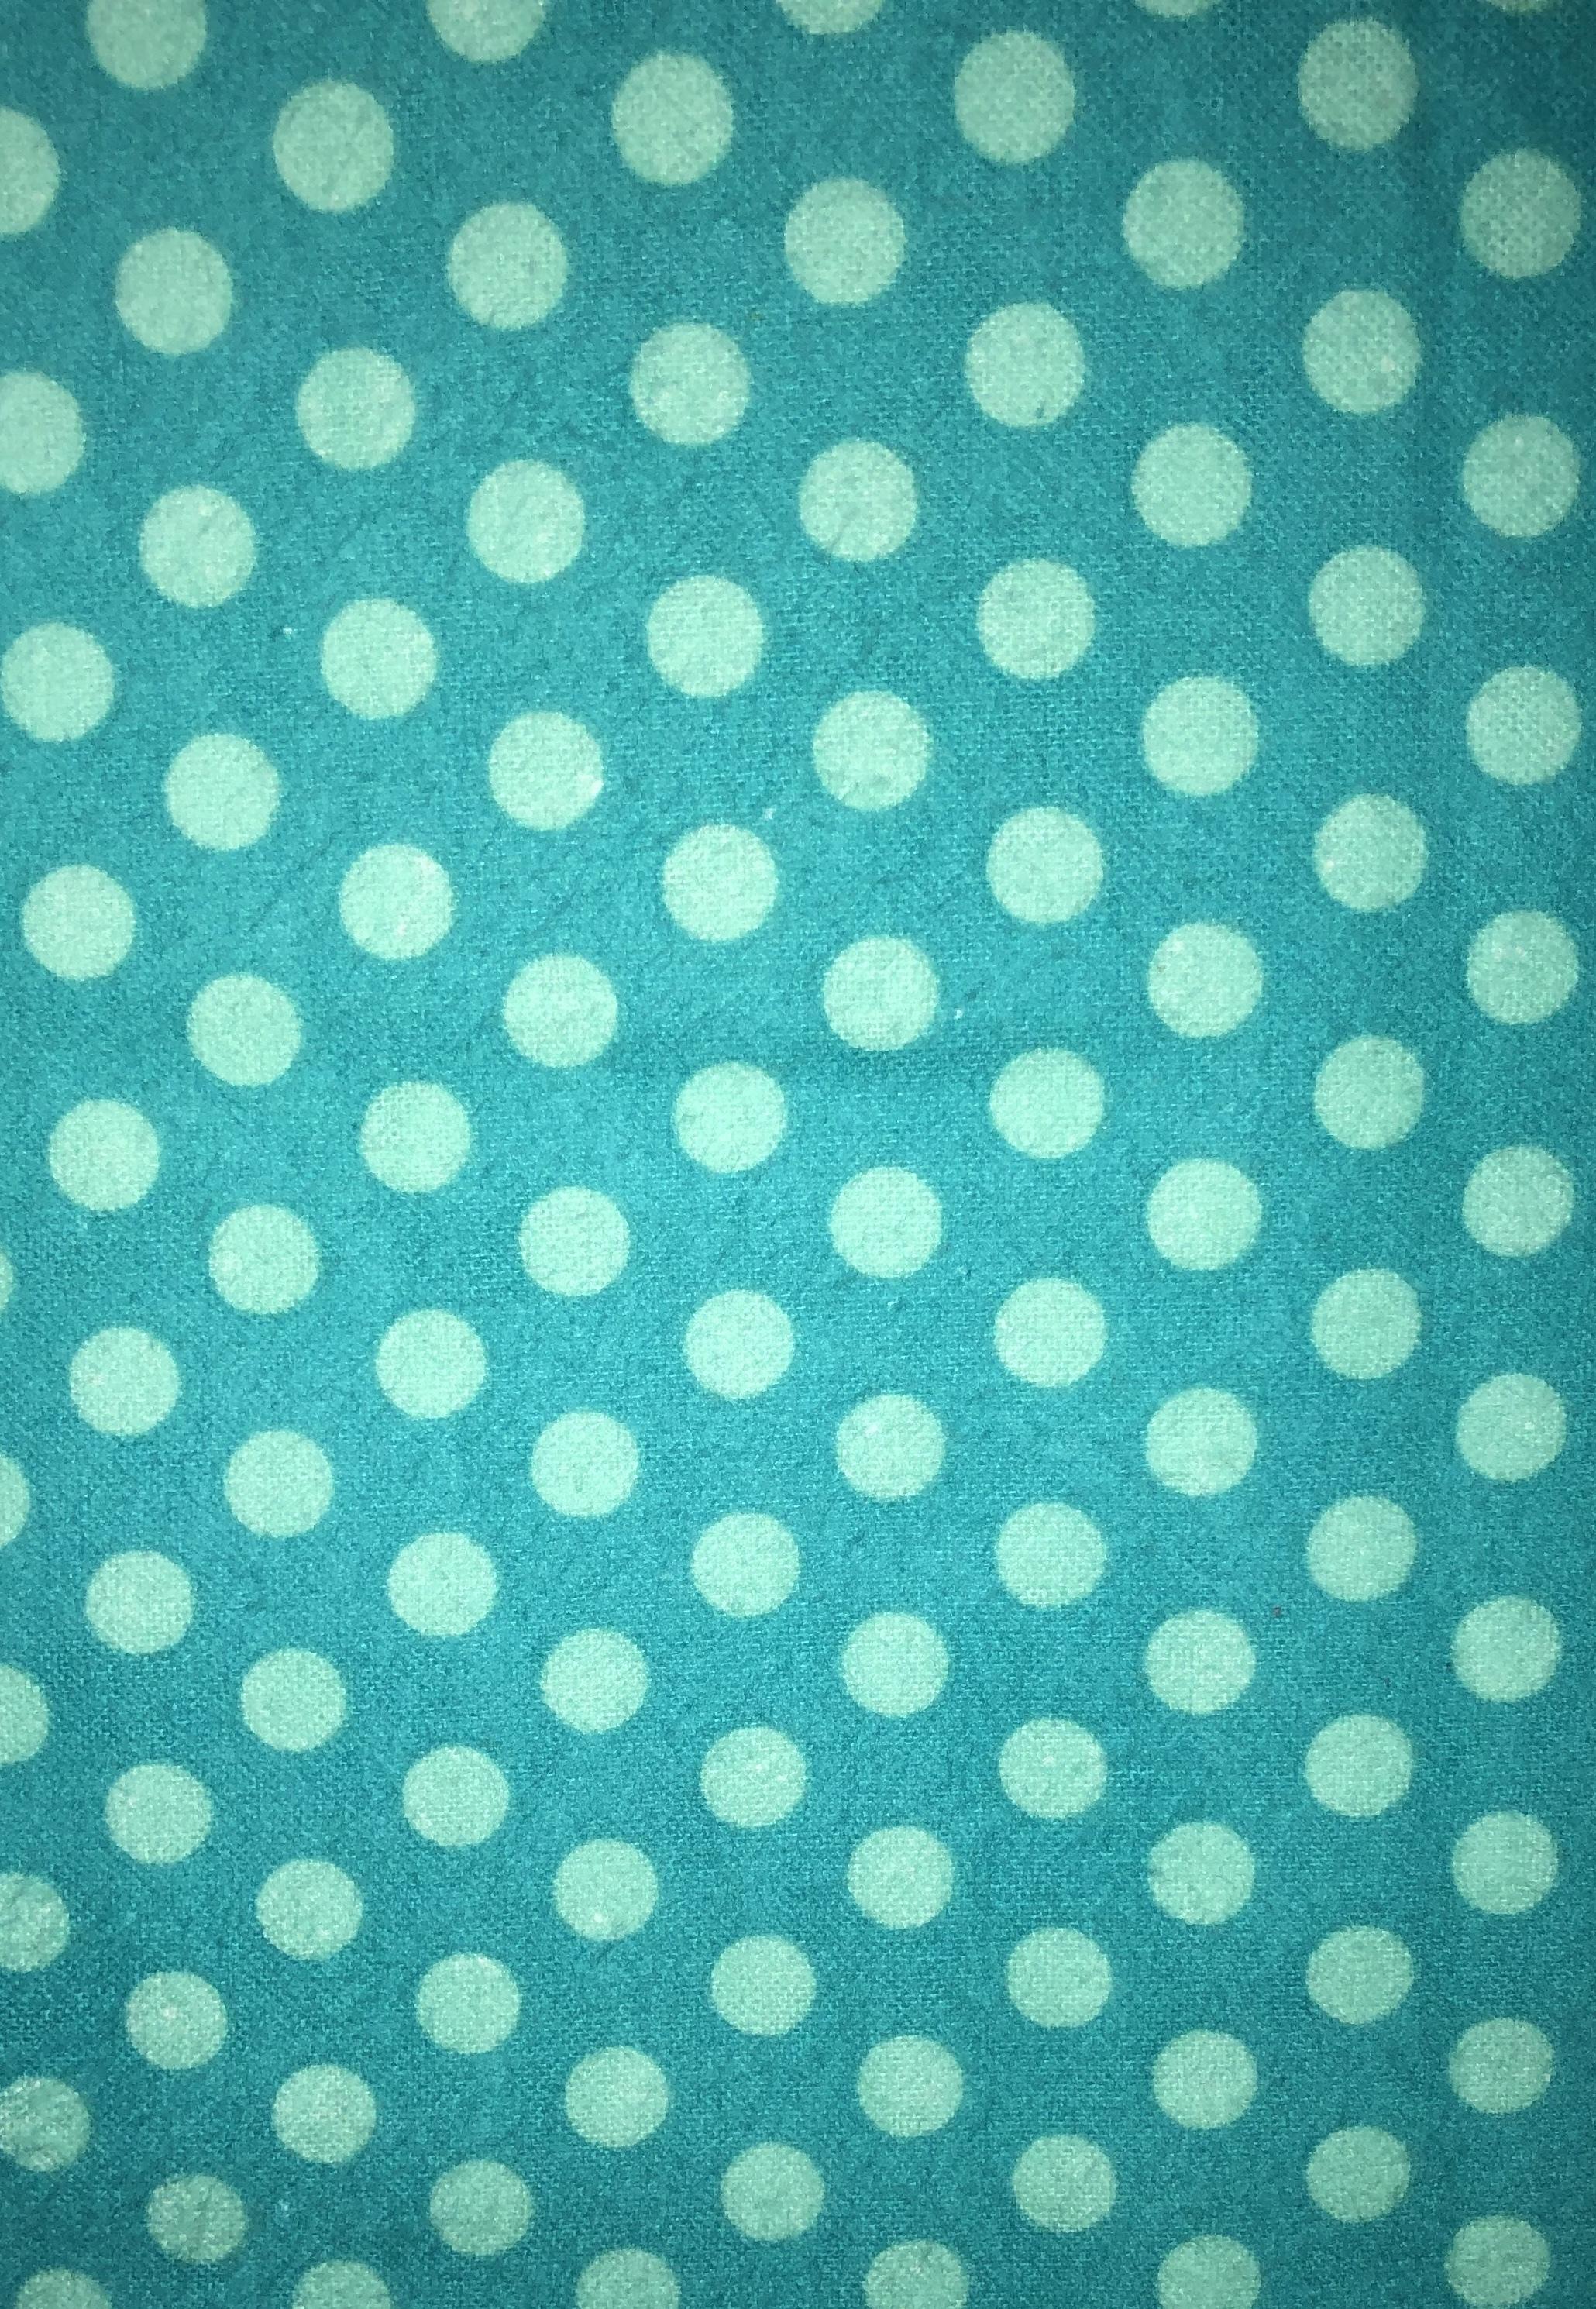 Aqua Polka Dot Flannel - 1/2m cut 55174